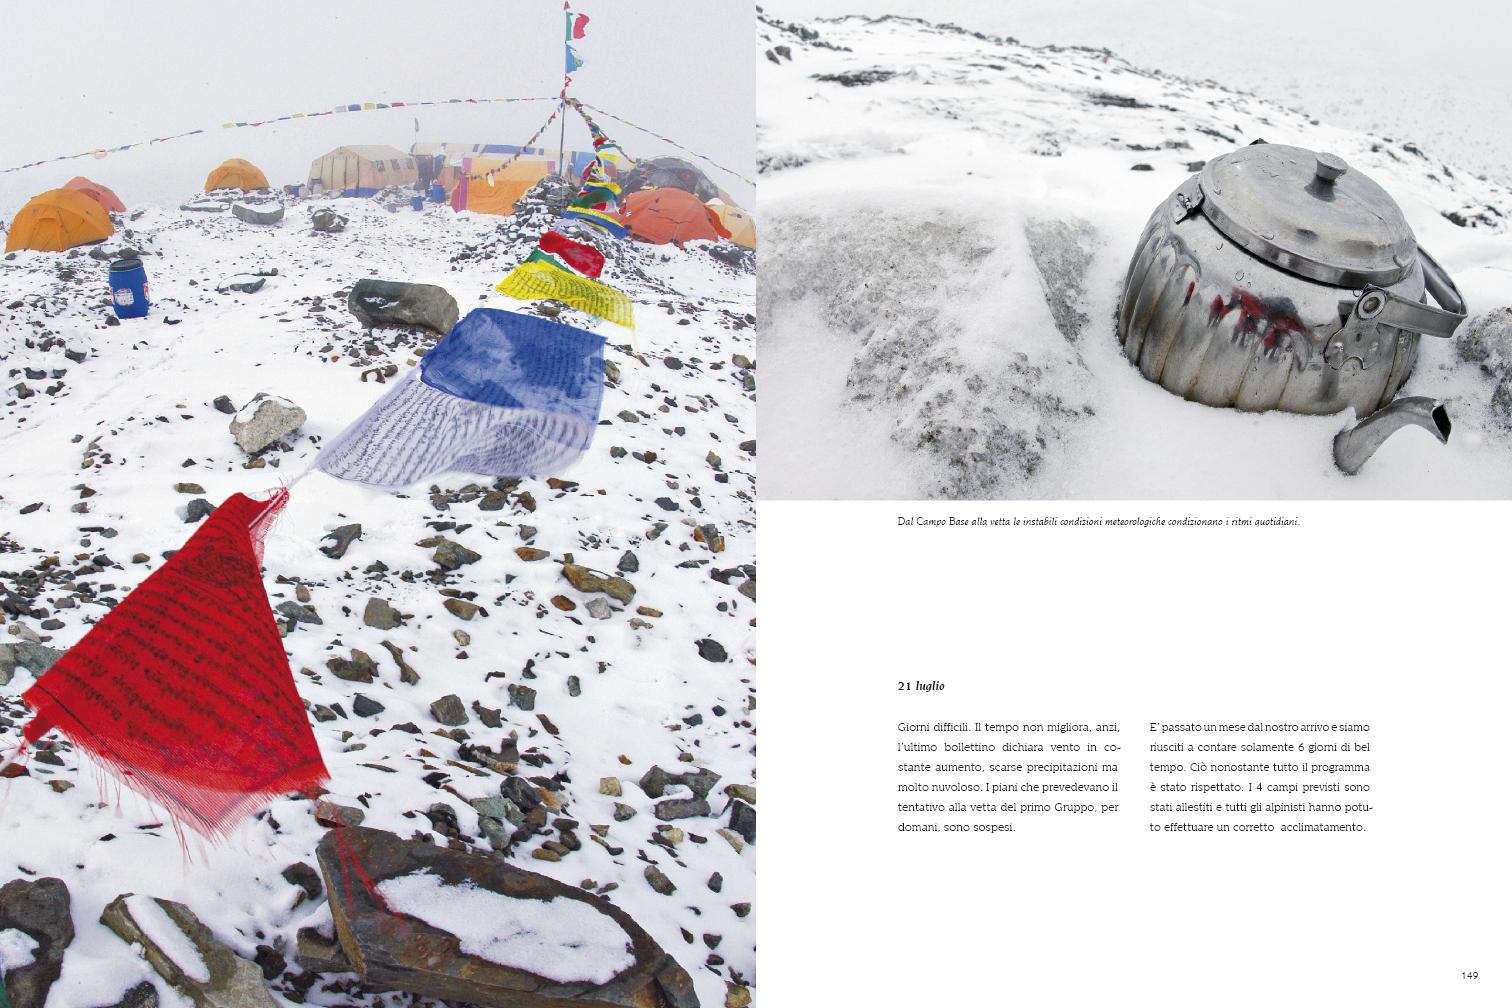 K2 EXPEDITION 1954-2004 Giuseppe Ghedina Fotografo - 076.jpg